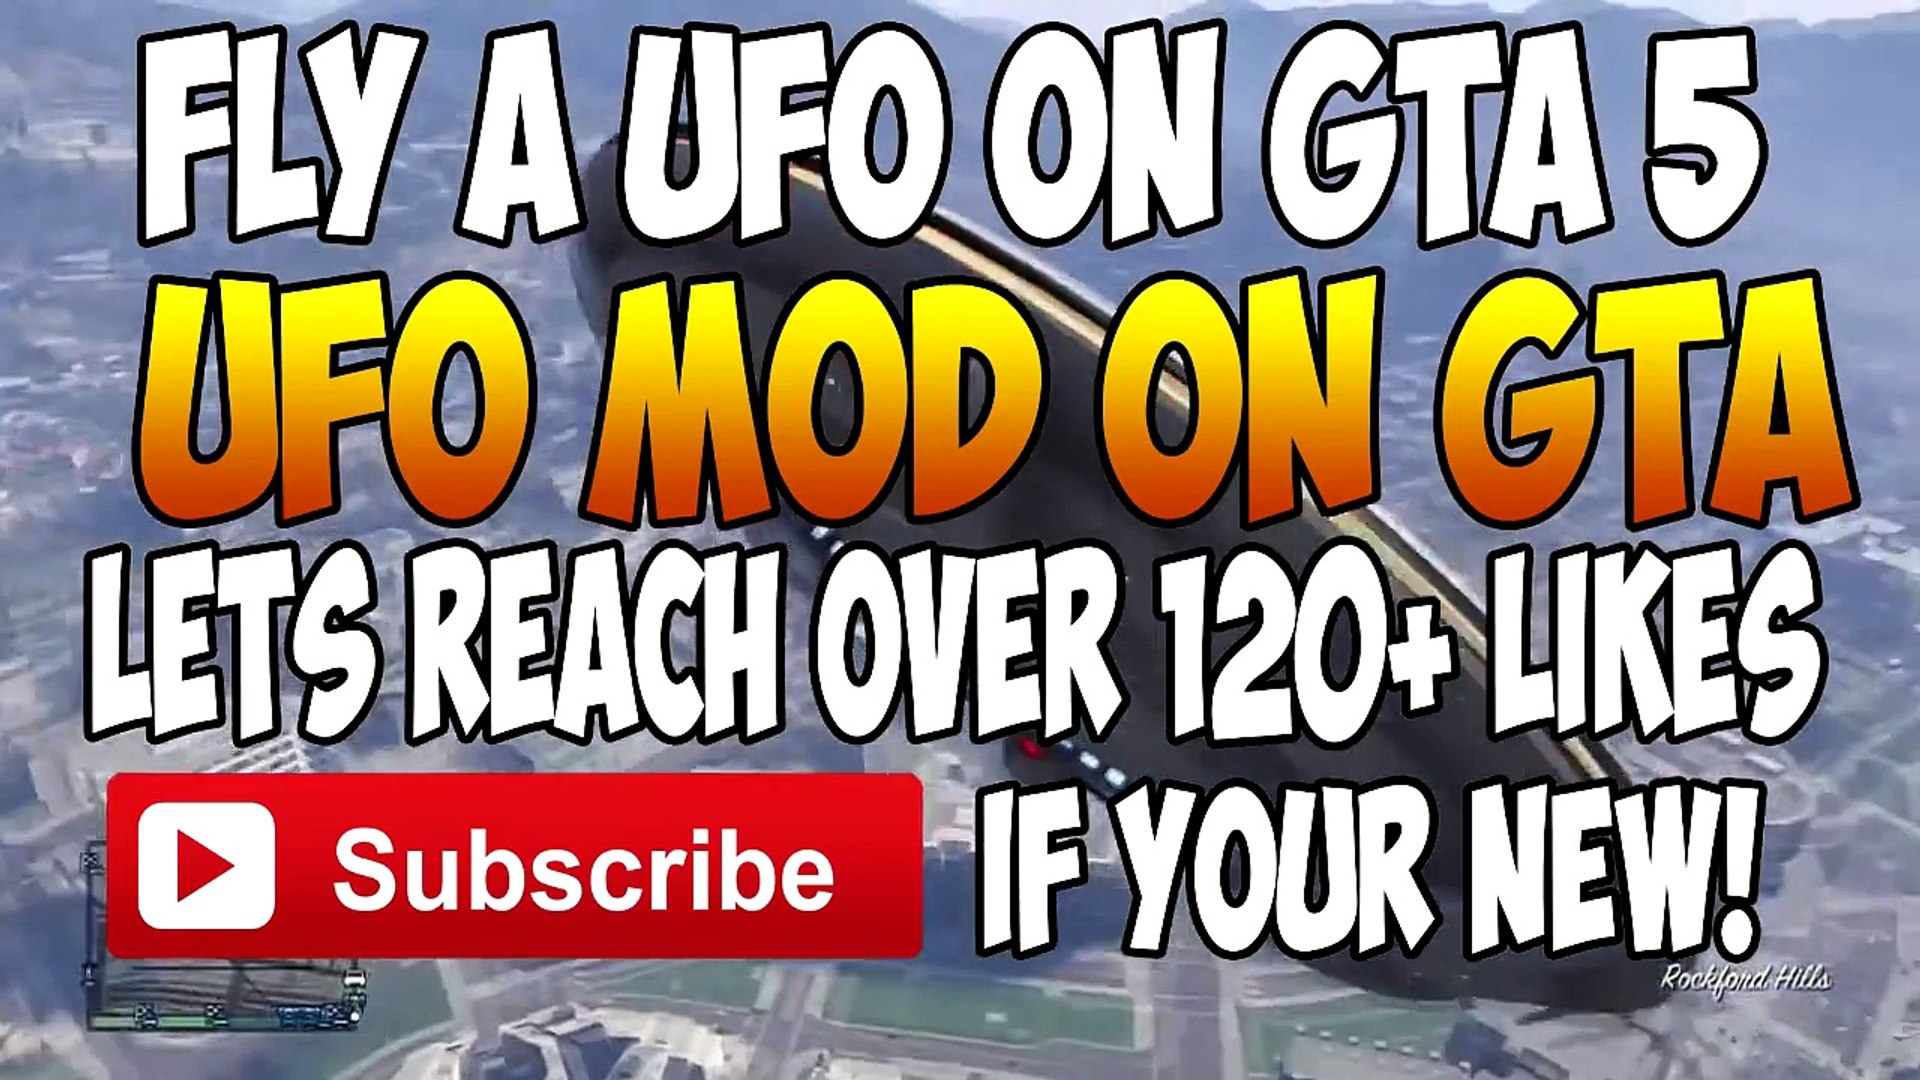 GTA 5 Mods - Flying a UFO -